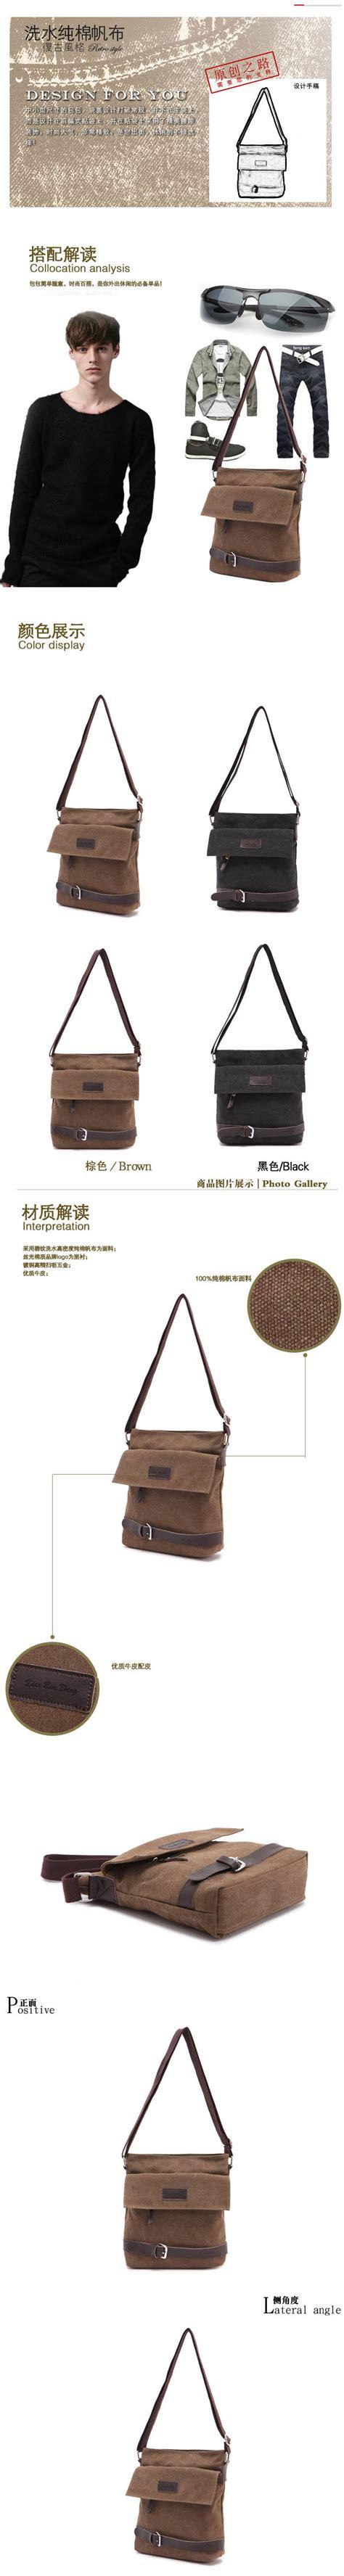 Slingbag Model sling bag vintage atau tas selempang